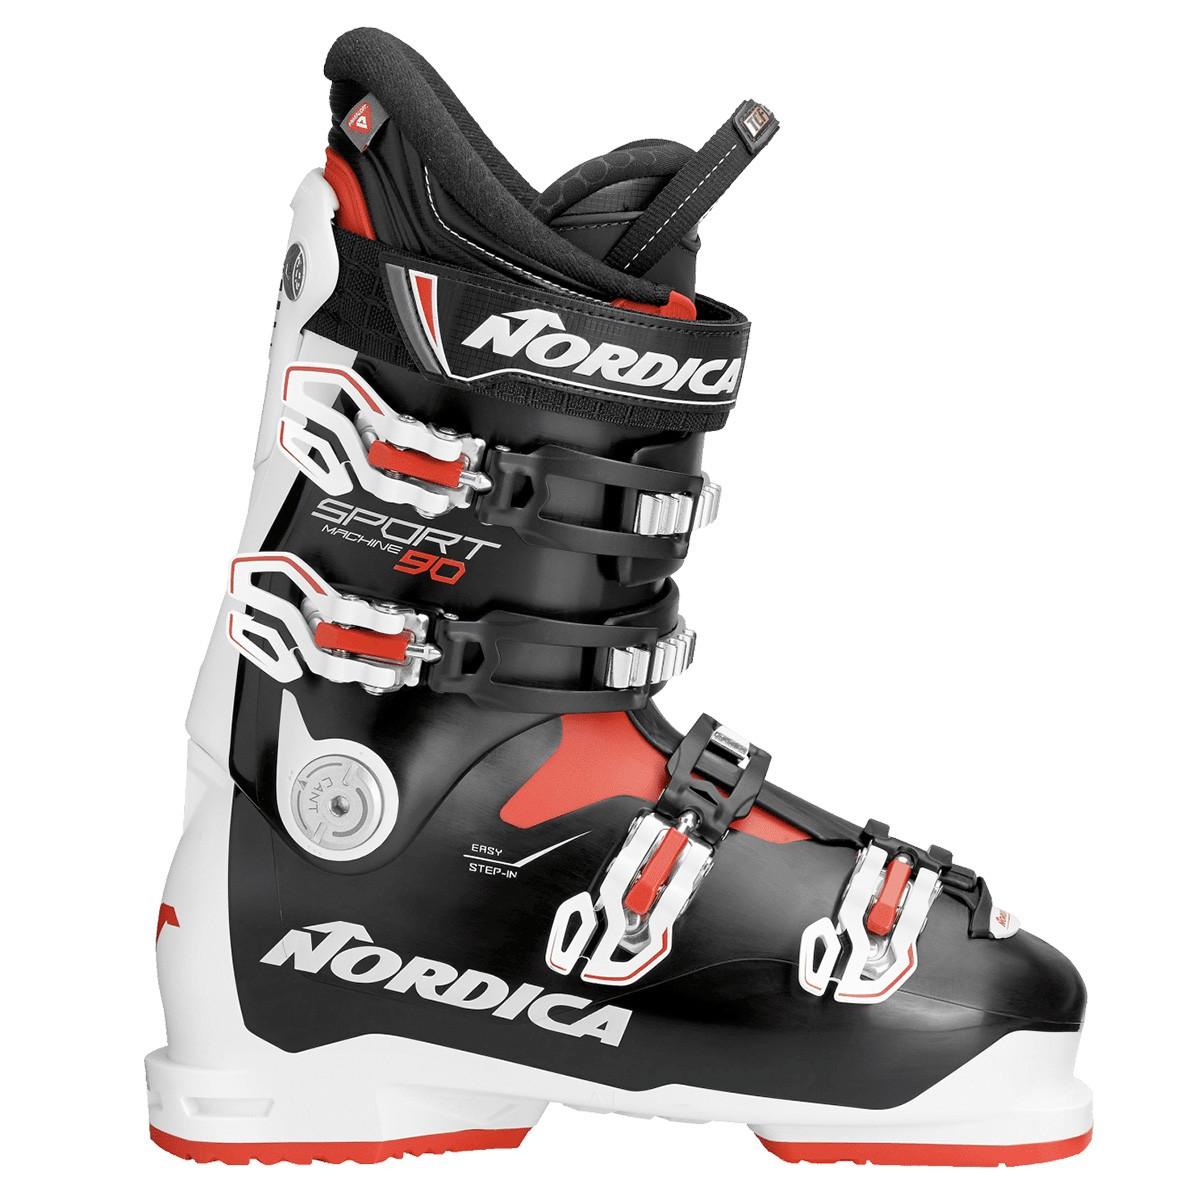 chaussures ski nordica sportmachine 90 chaussures ski. Black Bedroom Furniture Sets. Home Design Ideas